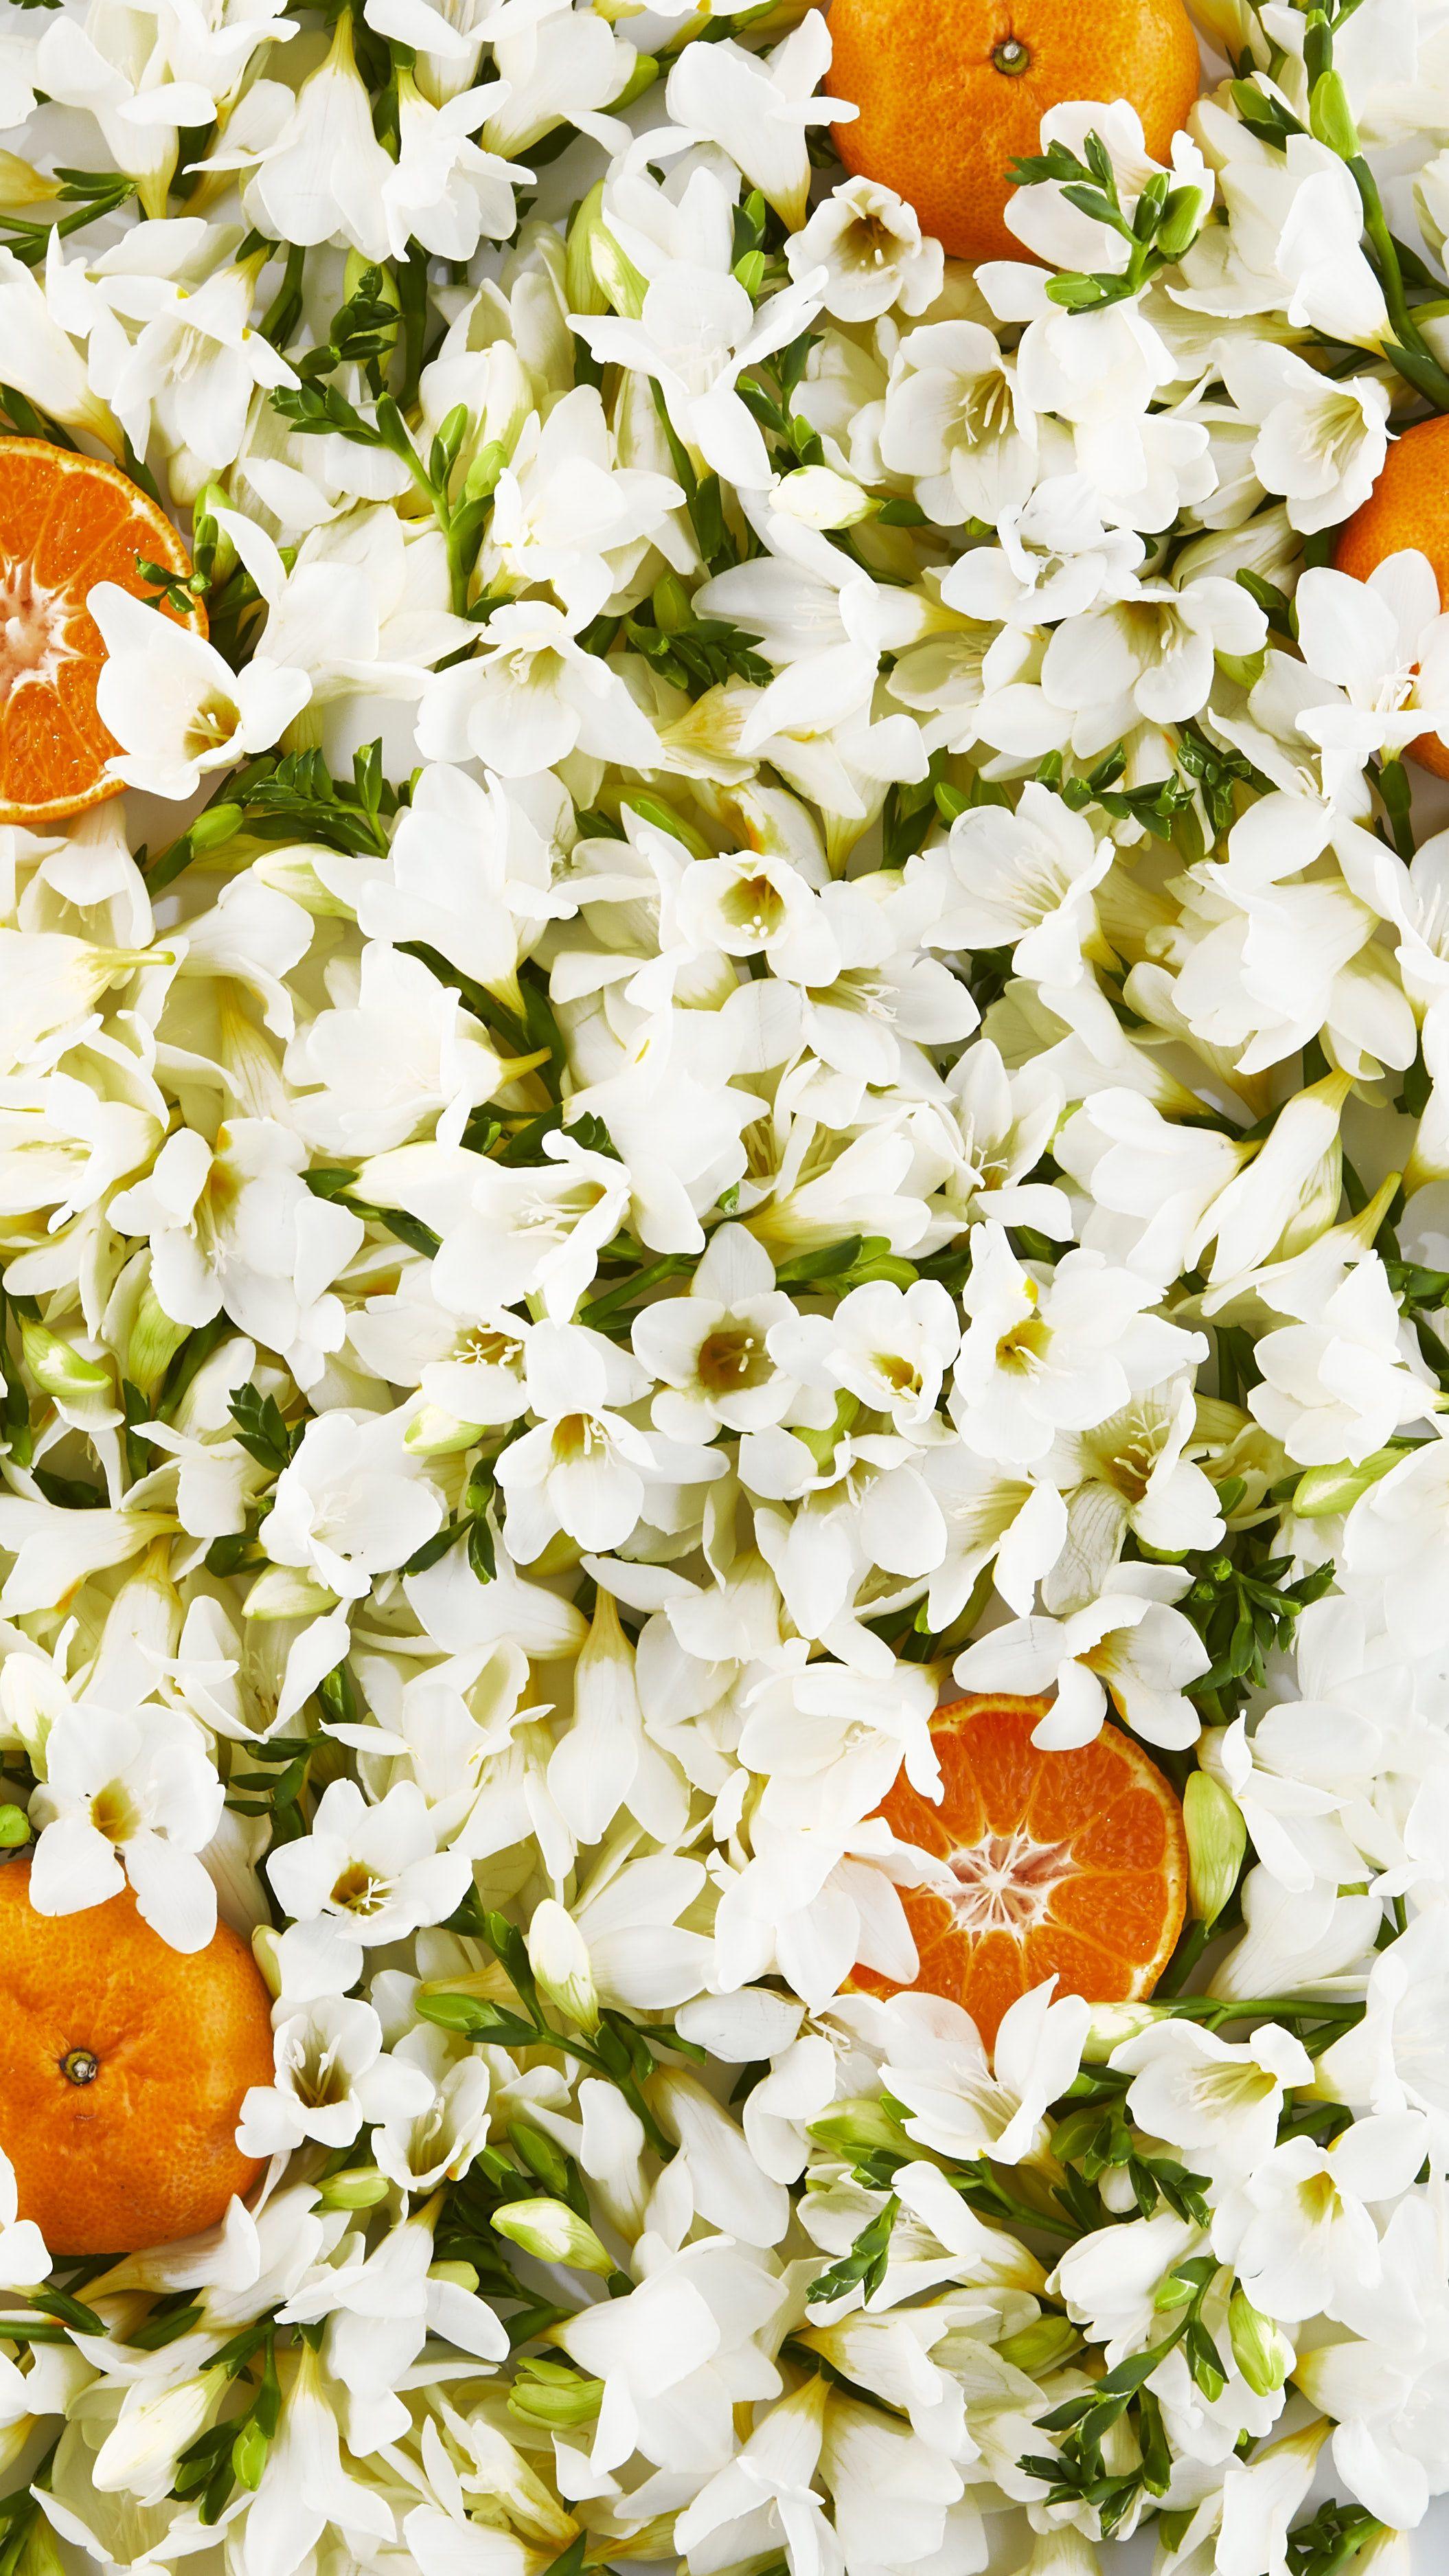 Freesia Clementine Iphone Wallpaper Wallpaper Iphone Wallpaper Wallpaper Backgrounds